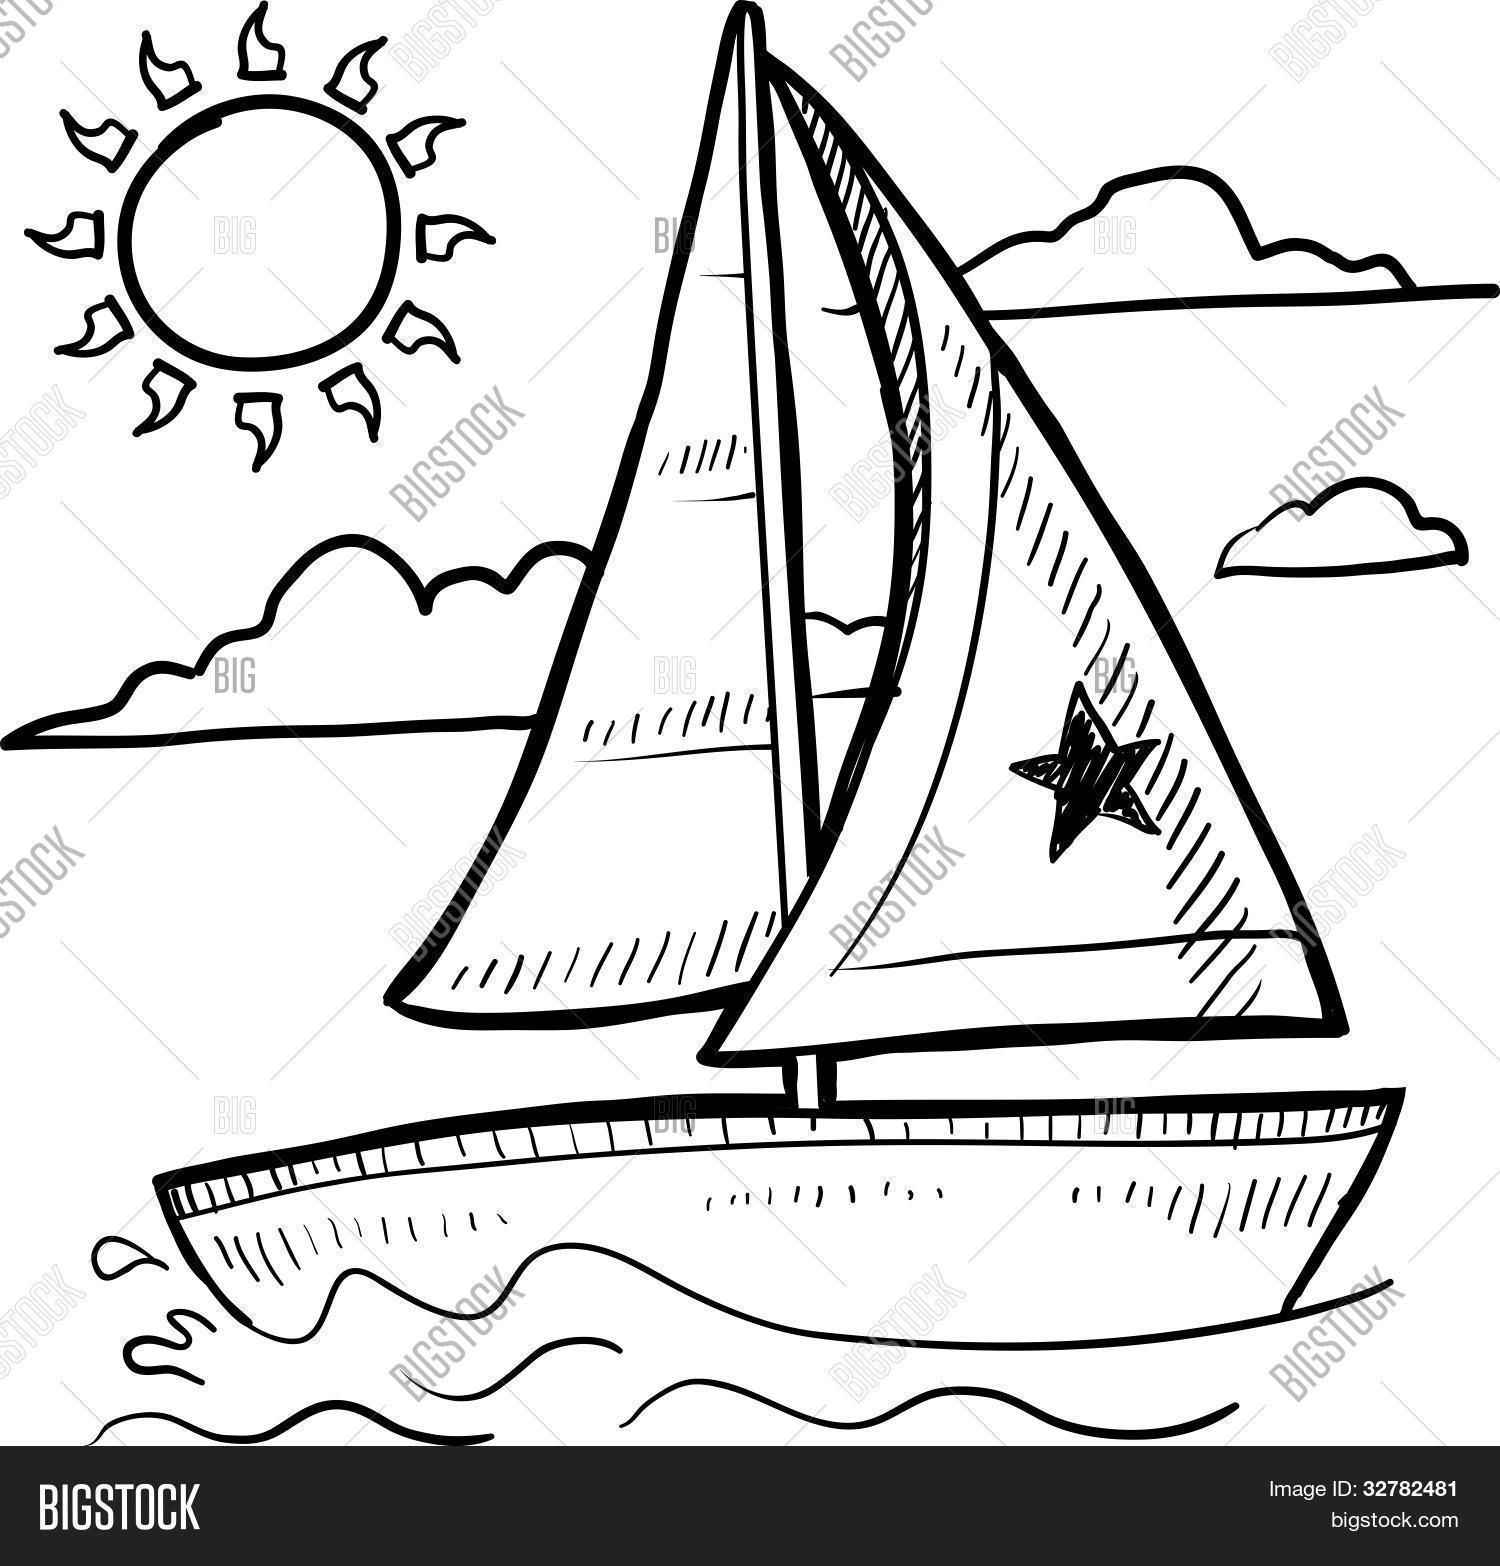 1500x1566 Sailboat Sketch Vector Amp Photo Bigstock